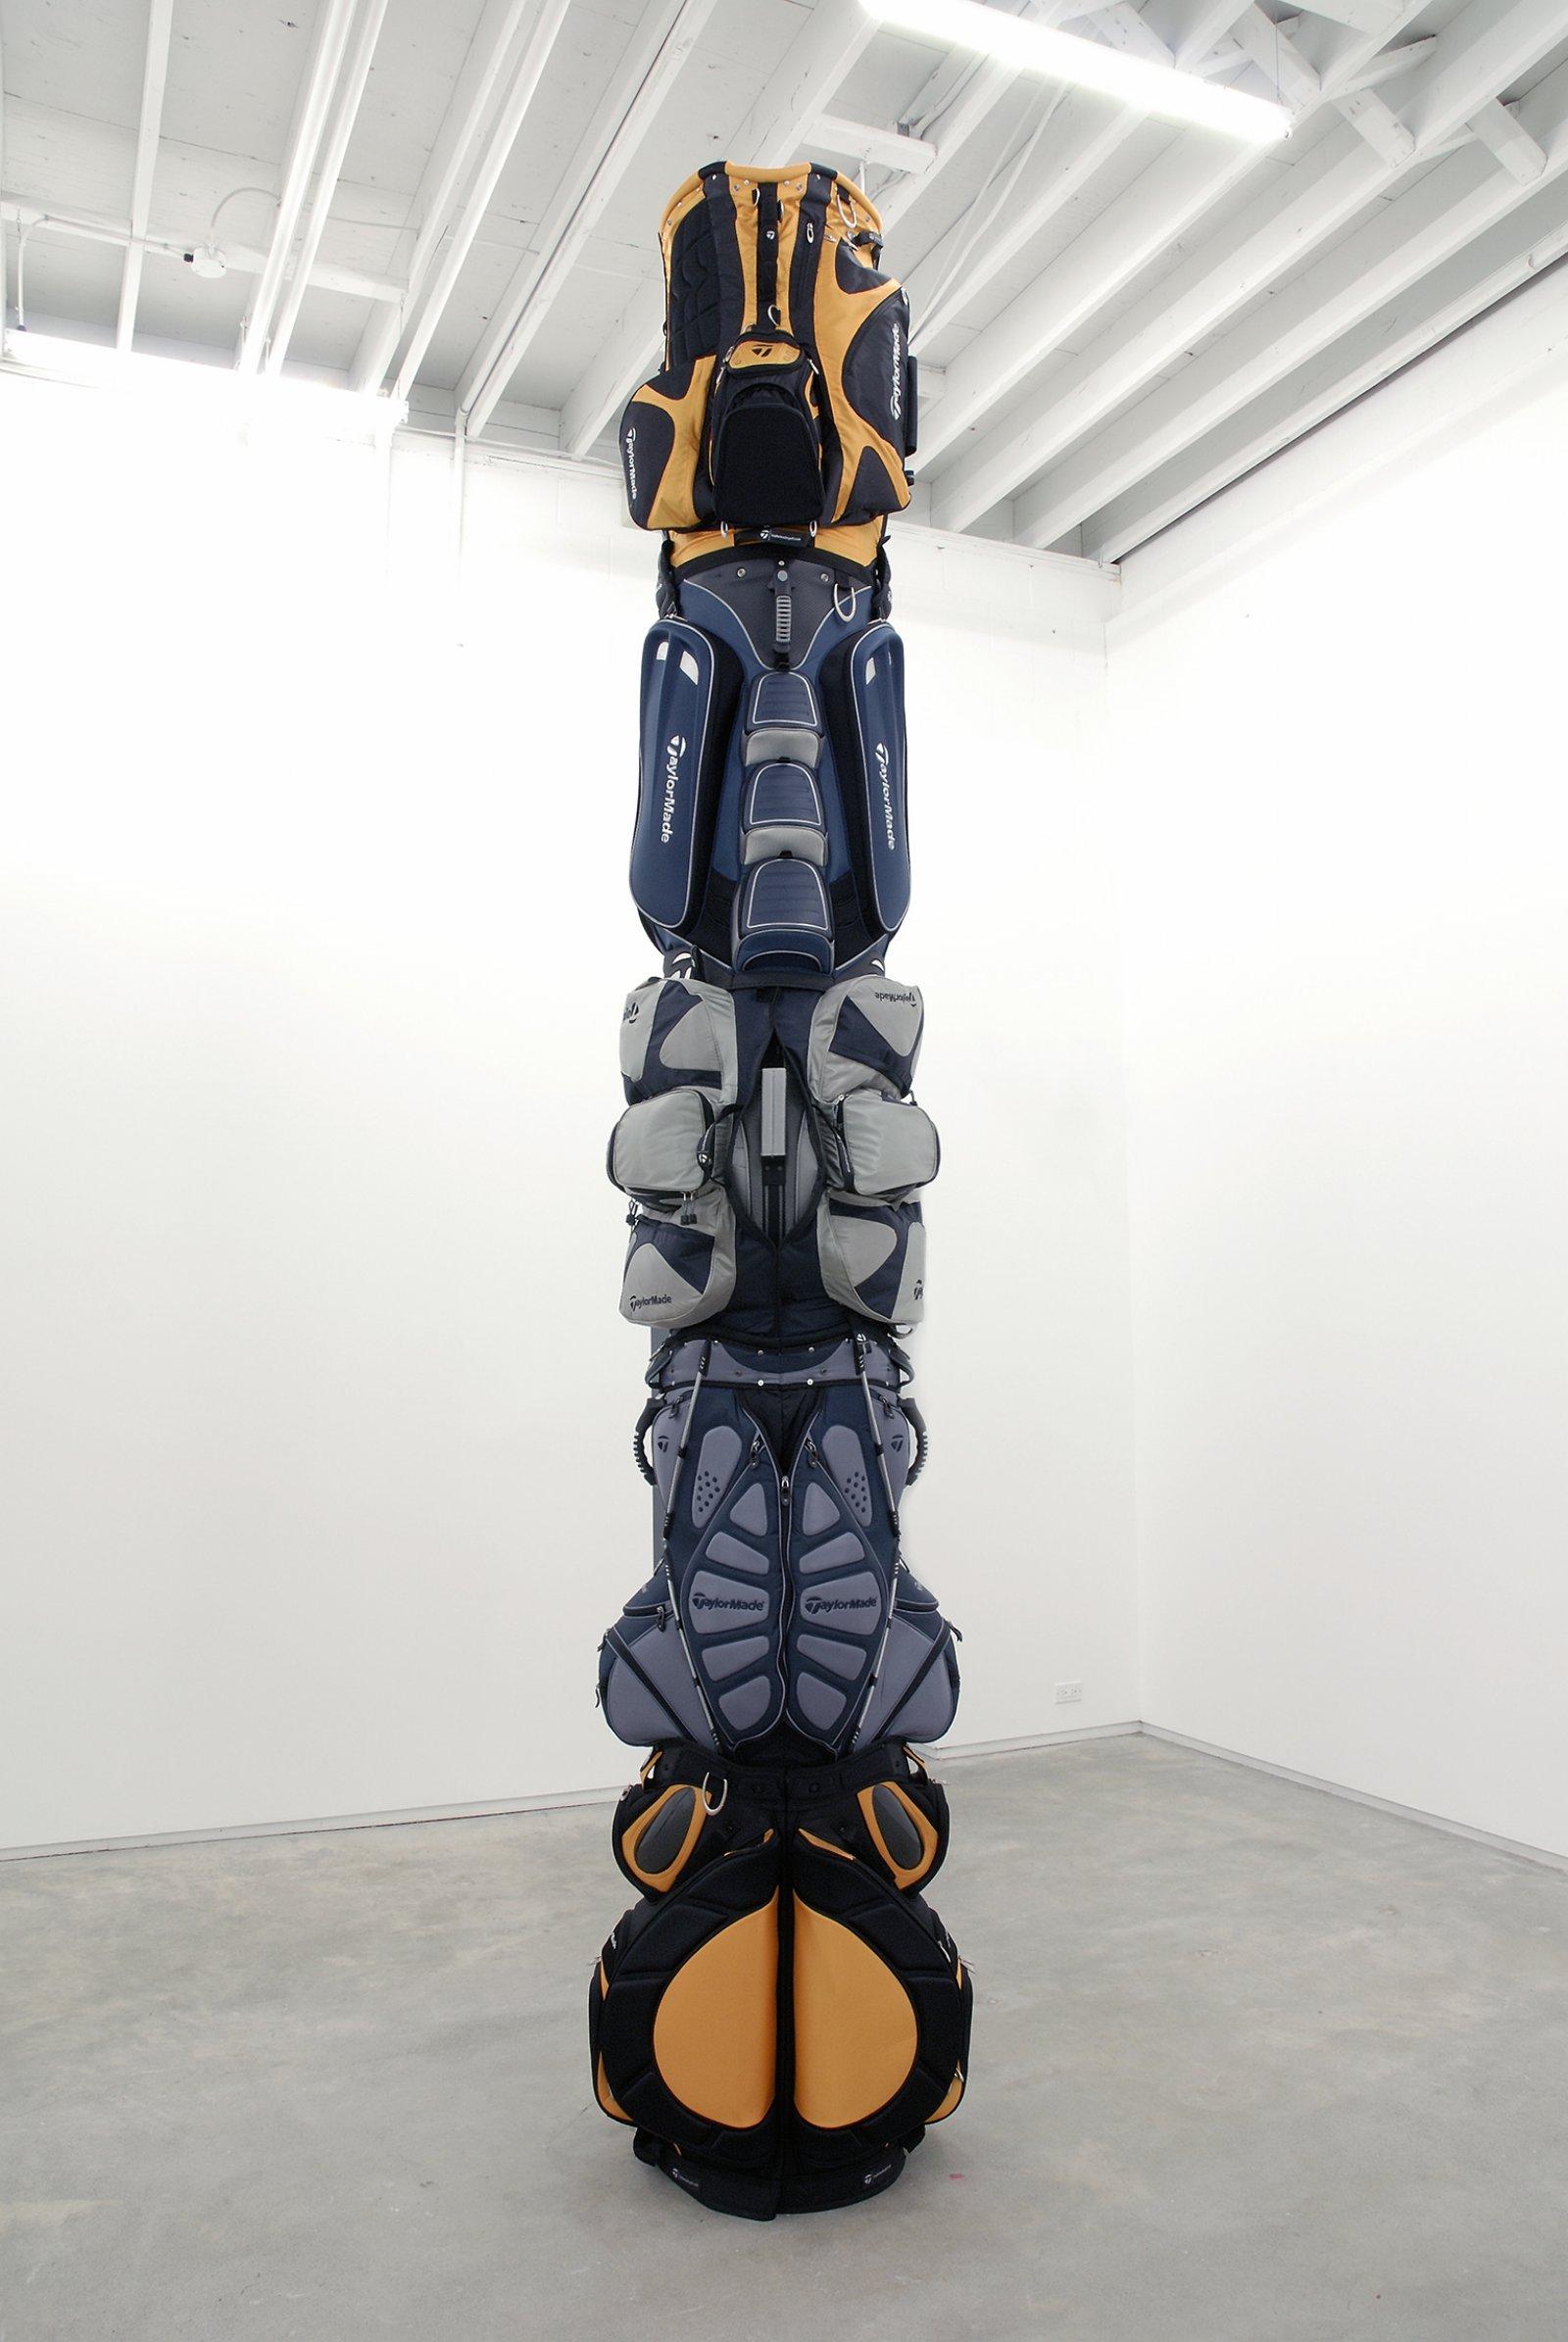 Brian Jungen, 1970, 2007, golf bags, cardboard tube, 151 x 30 x 35 in. (384 x 76 x 89 cm)   by Brian Jungen